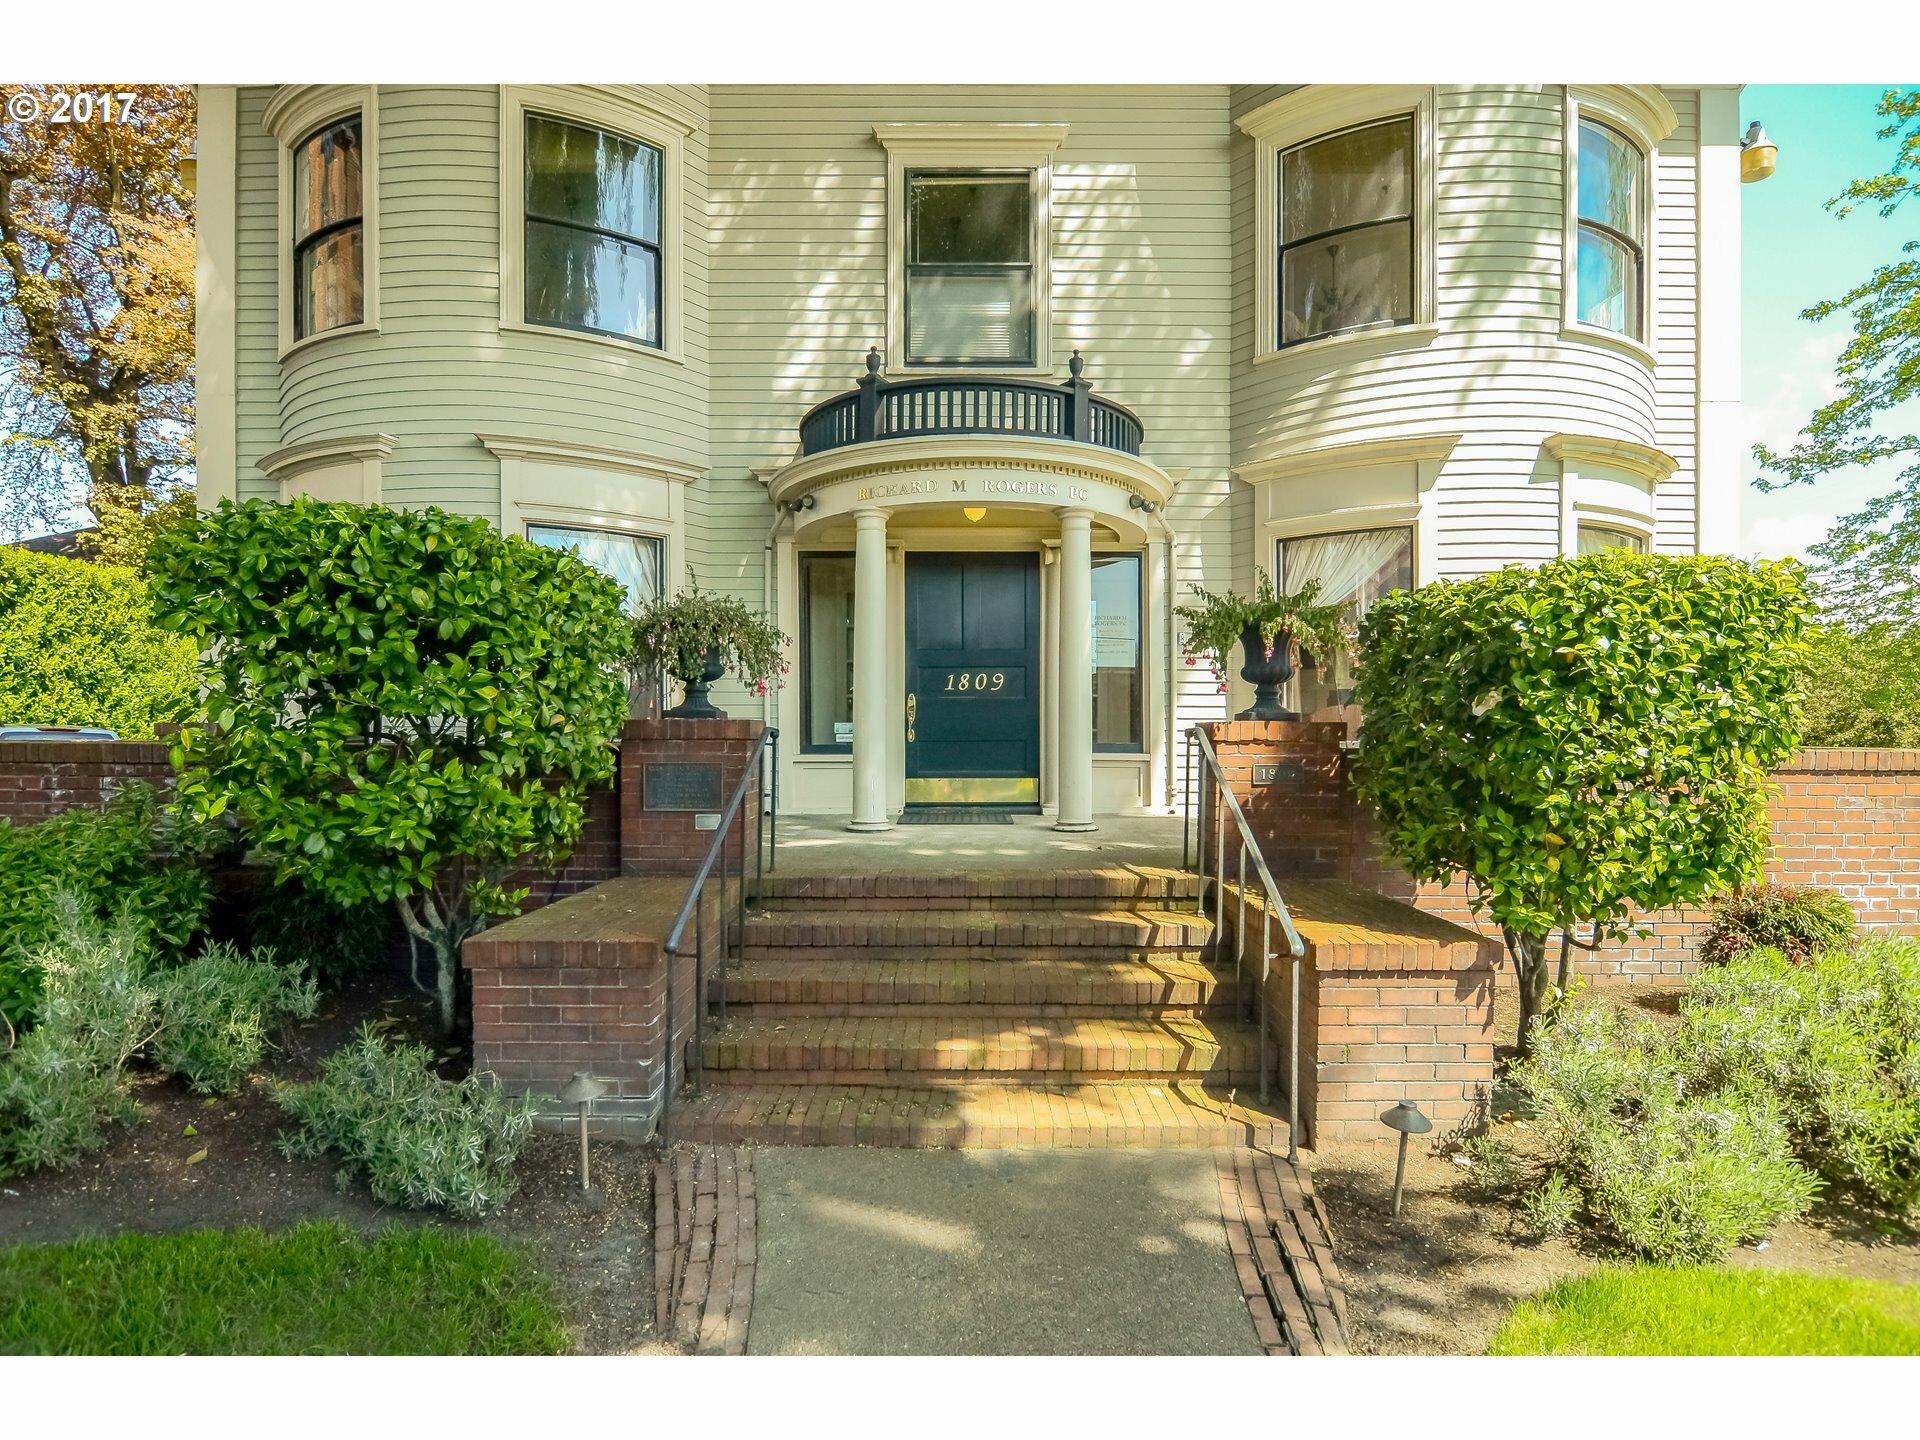 1809 Nw Johnson St, Portland, OR - USA (photo 2)